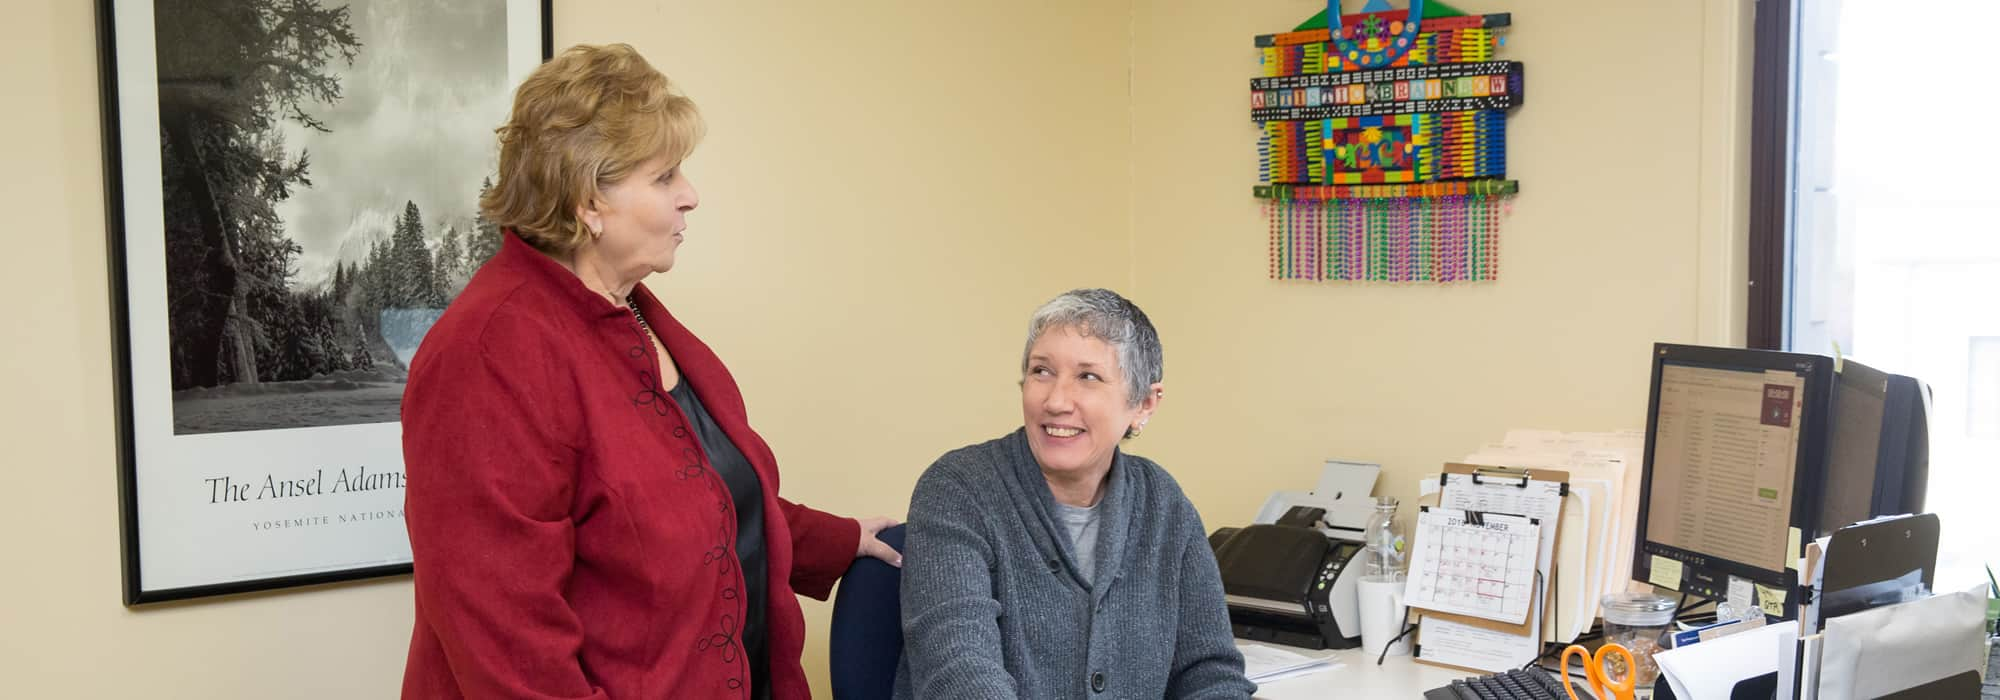 Accounting and Tax Associates East Longmeadow Northampton